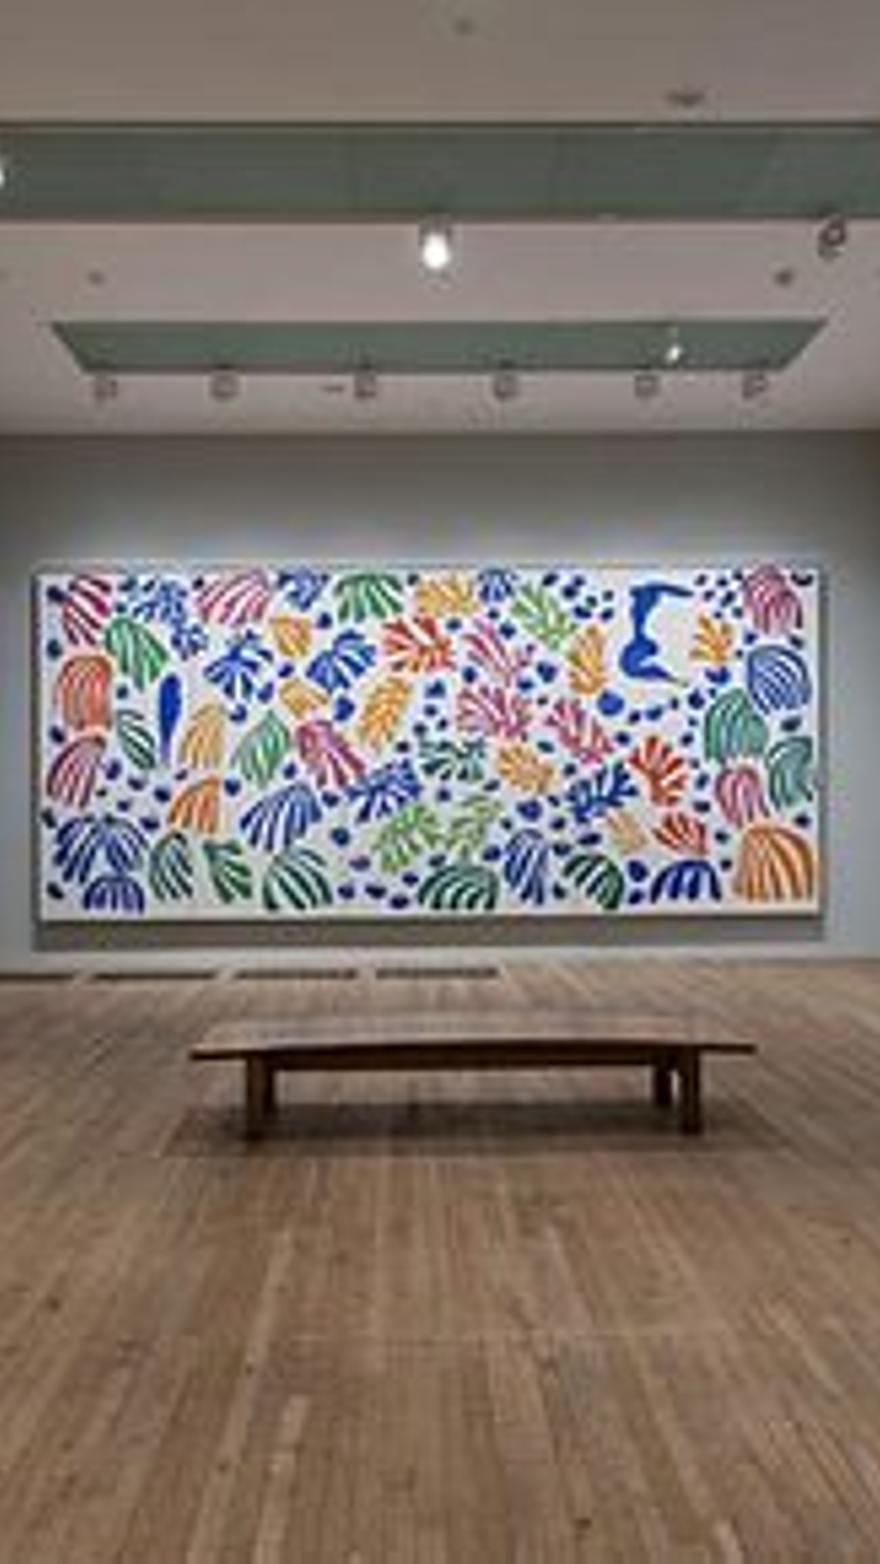 Matisse desde el Tate Modern y el MoMA